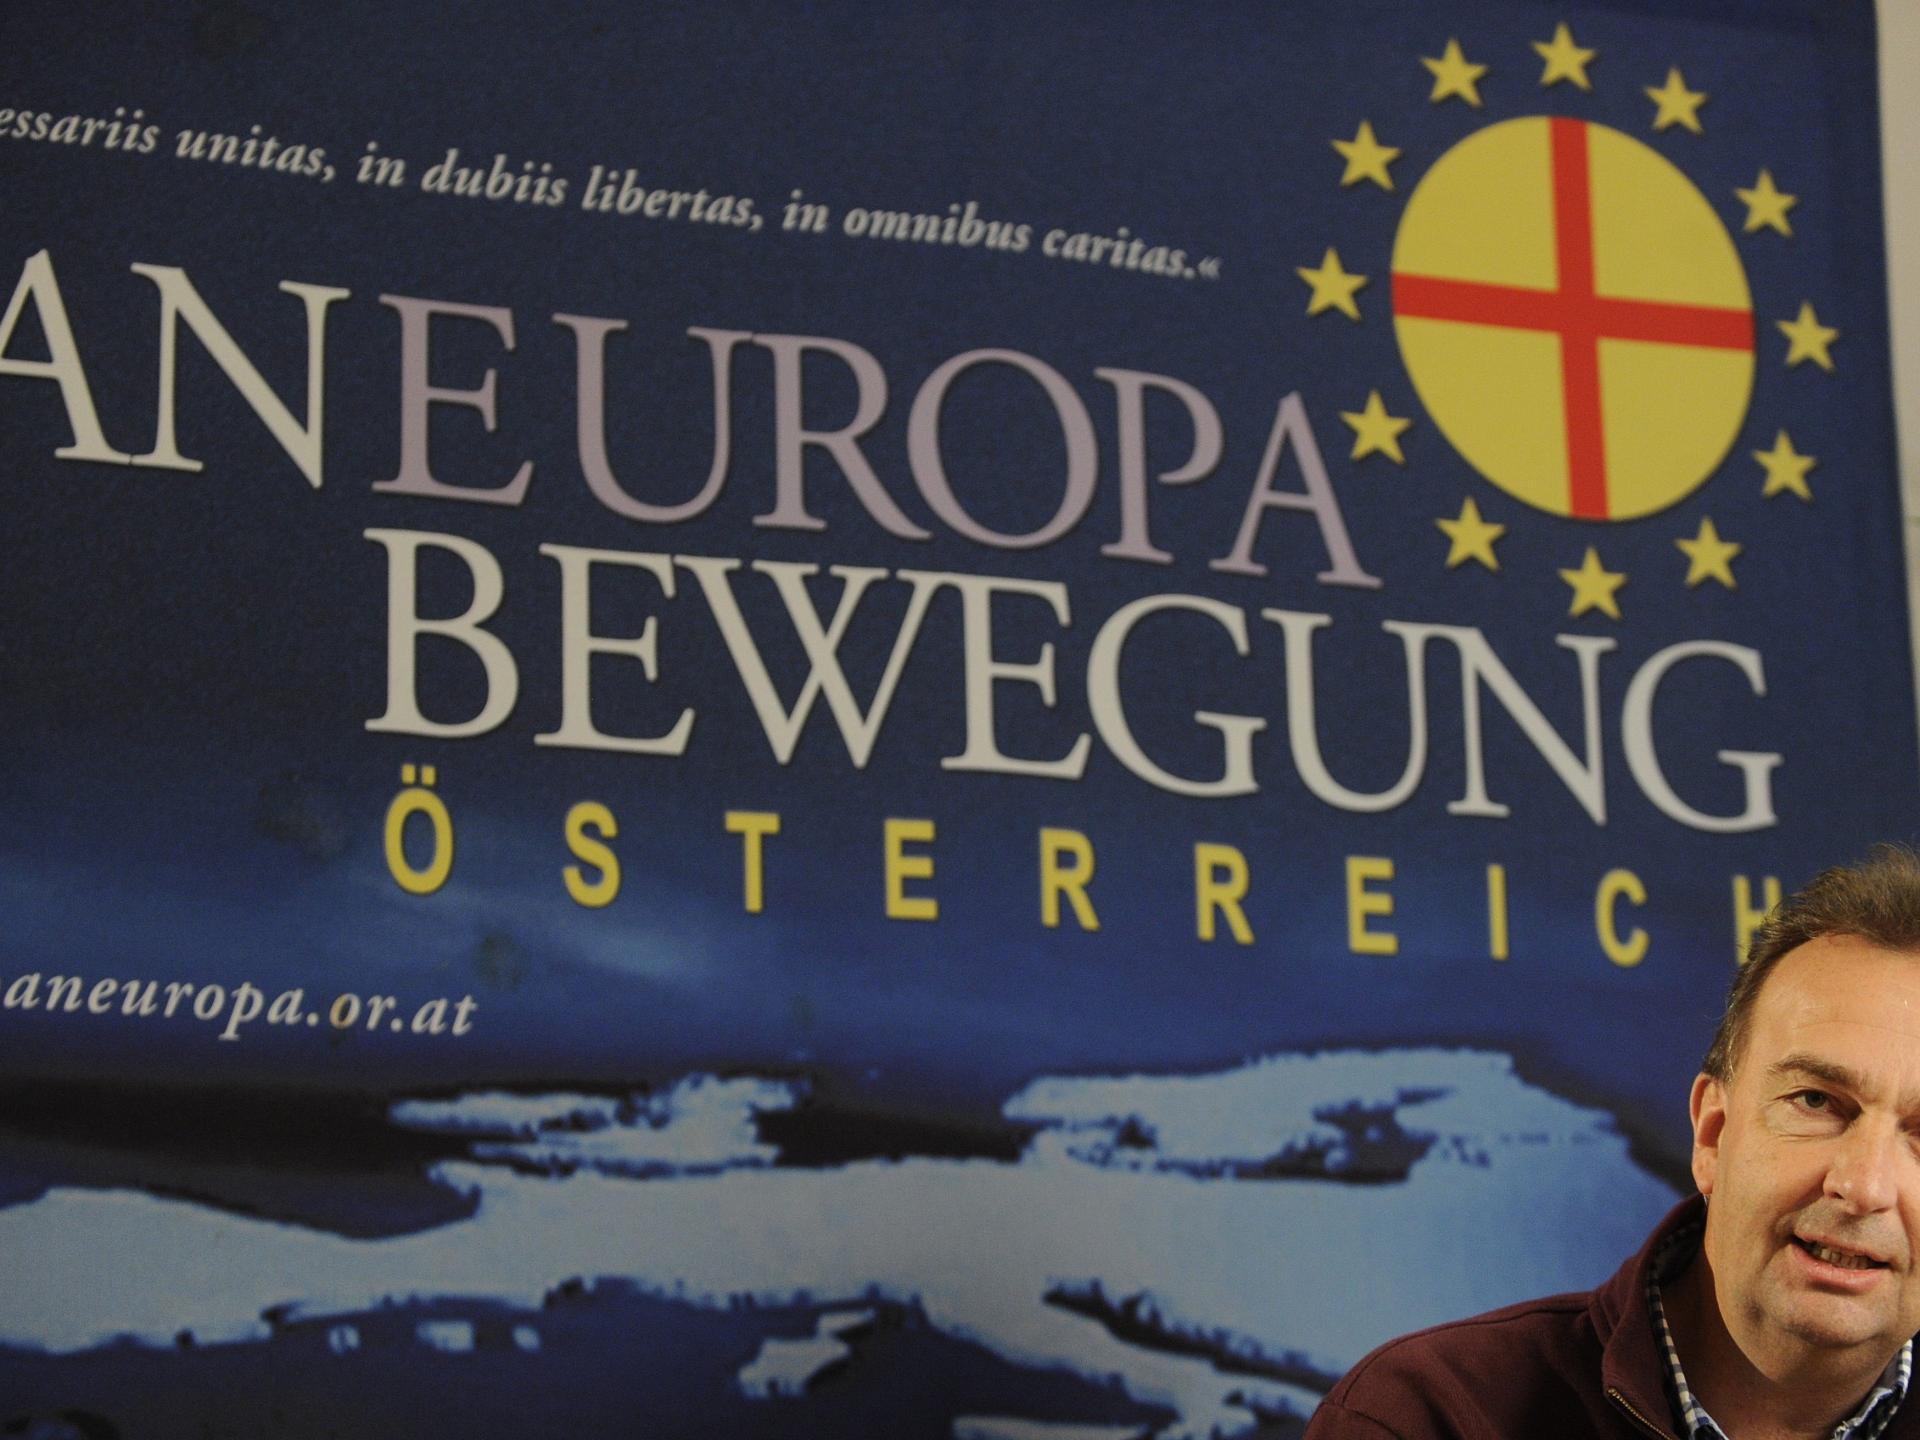 Karl de habsbourg lorraine un prince europeen